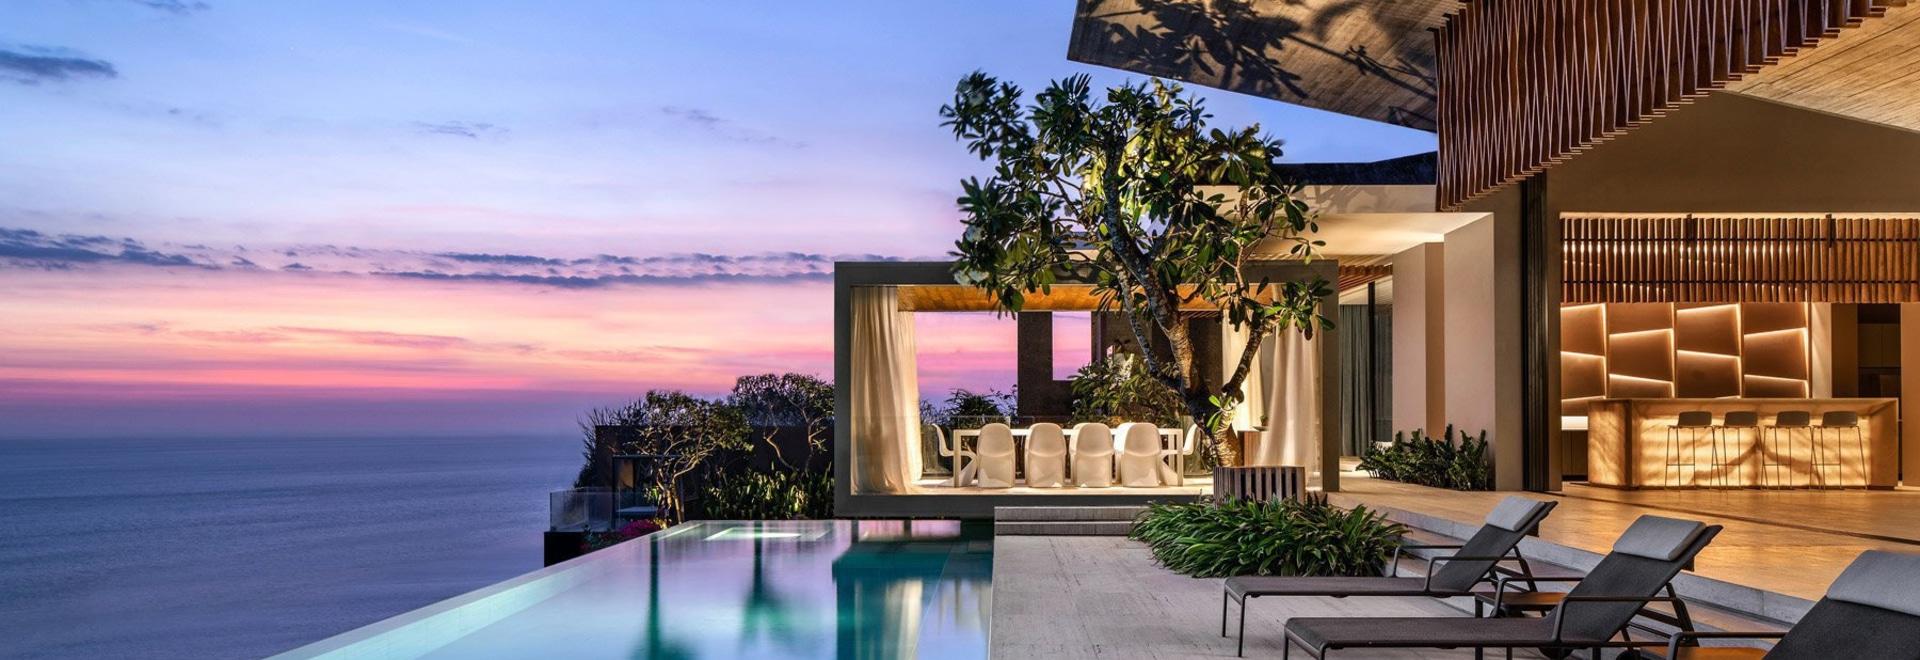 Saota Blends Indoor And Outdoor Space To Form Uluwatu House In Bali Pecatu South Kuta Badung Regency Bali Indonesia